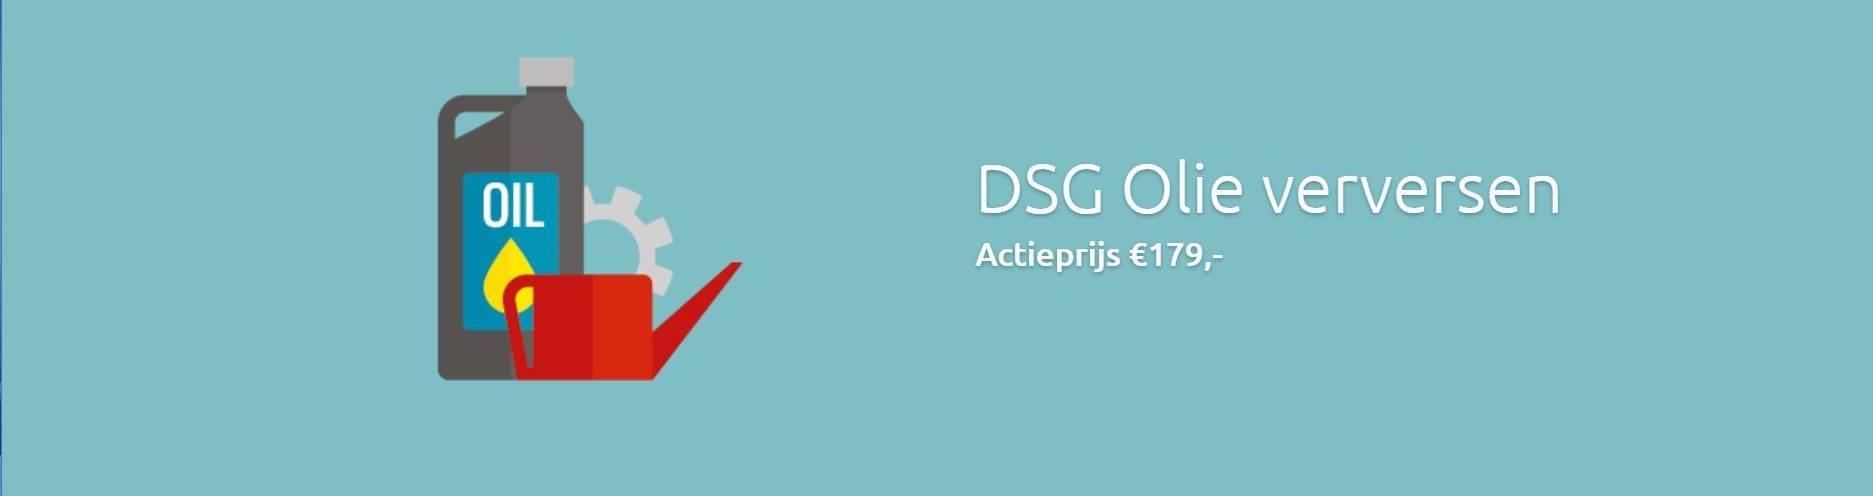 DSG Olie Verversen DSG Service dealer DSG specialist uw DSG dokter